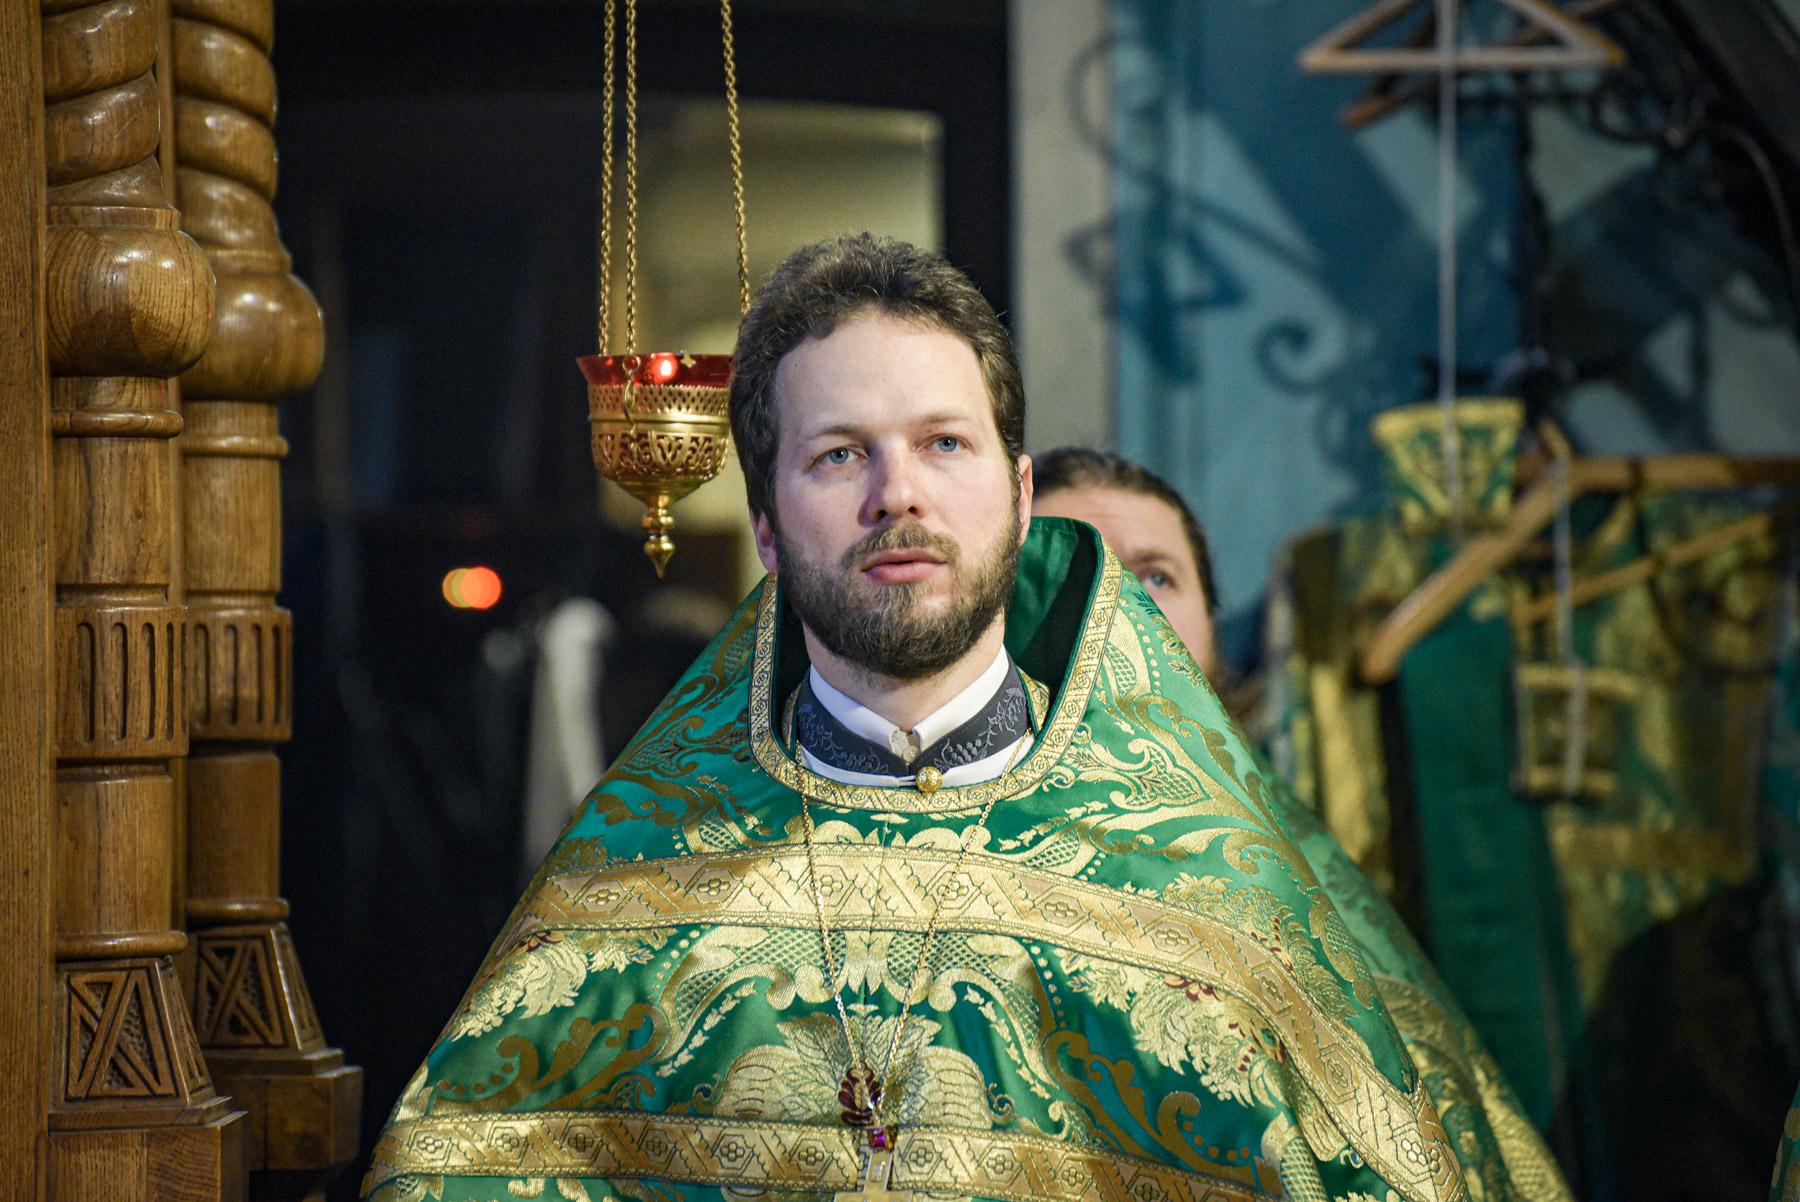 photos of orthodox christmas 0175 2